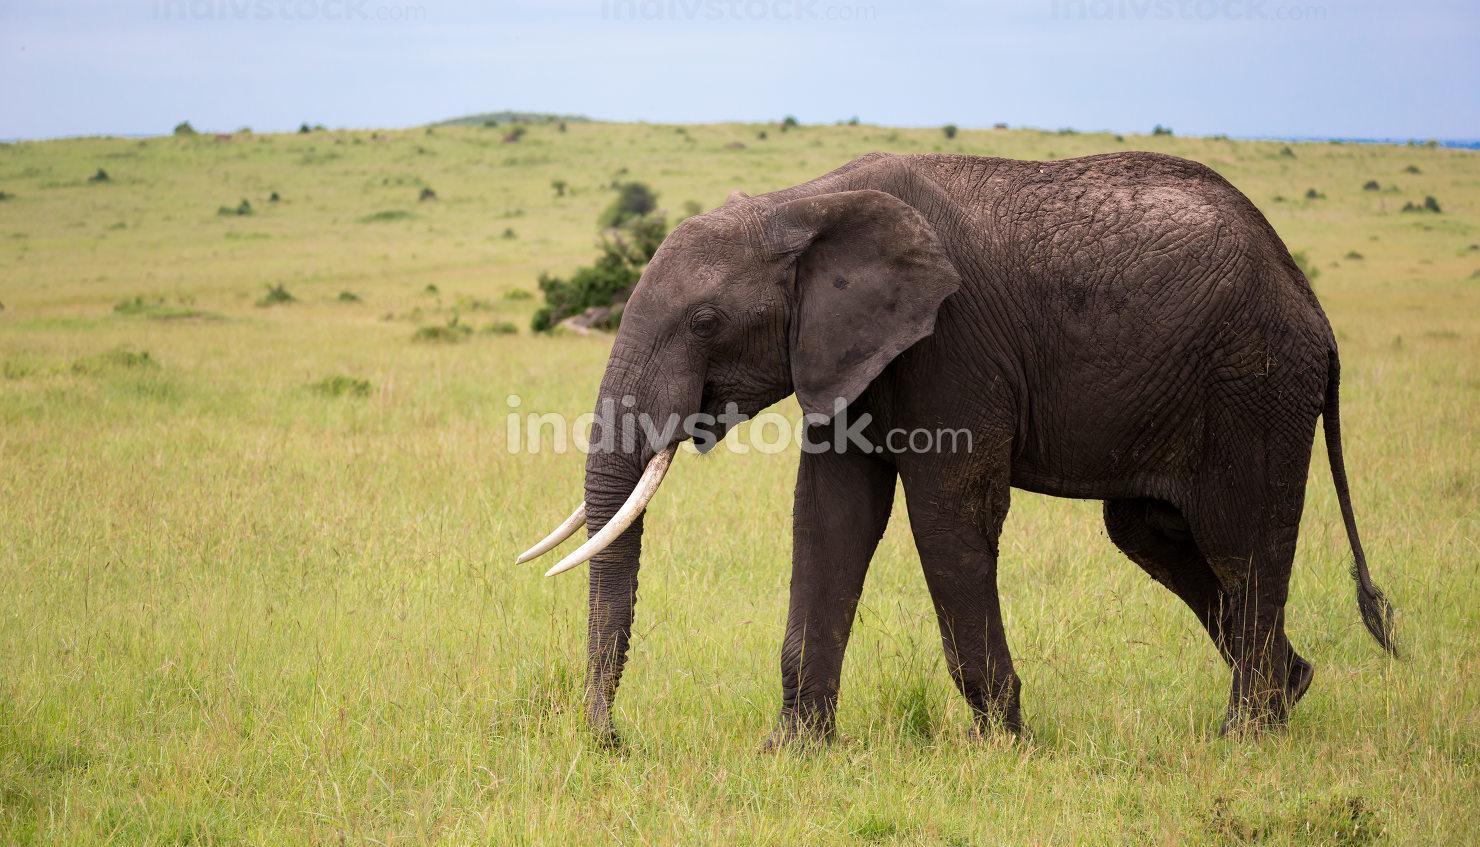 One elephant walking throught the savannah of Kenya